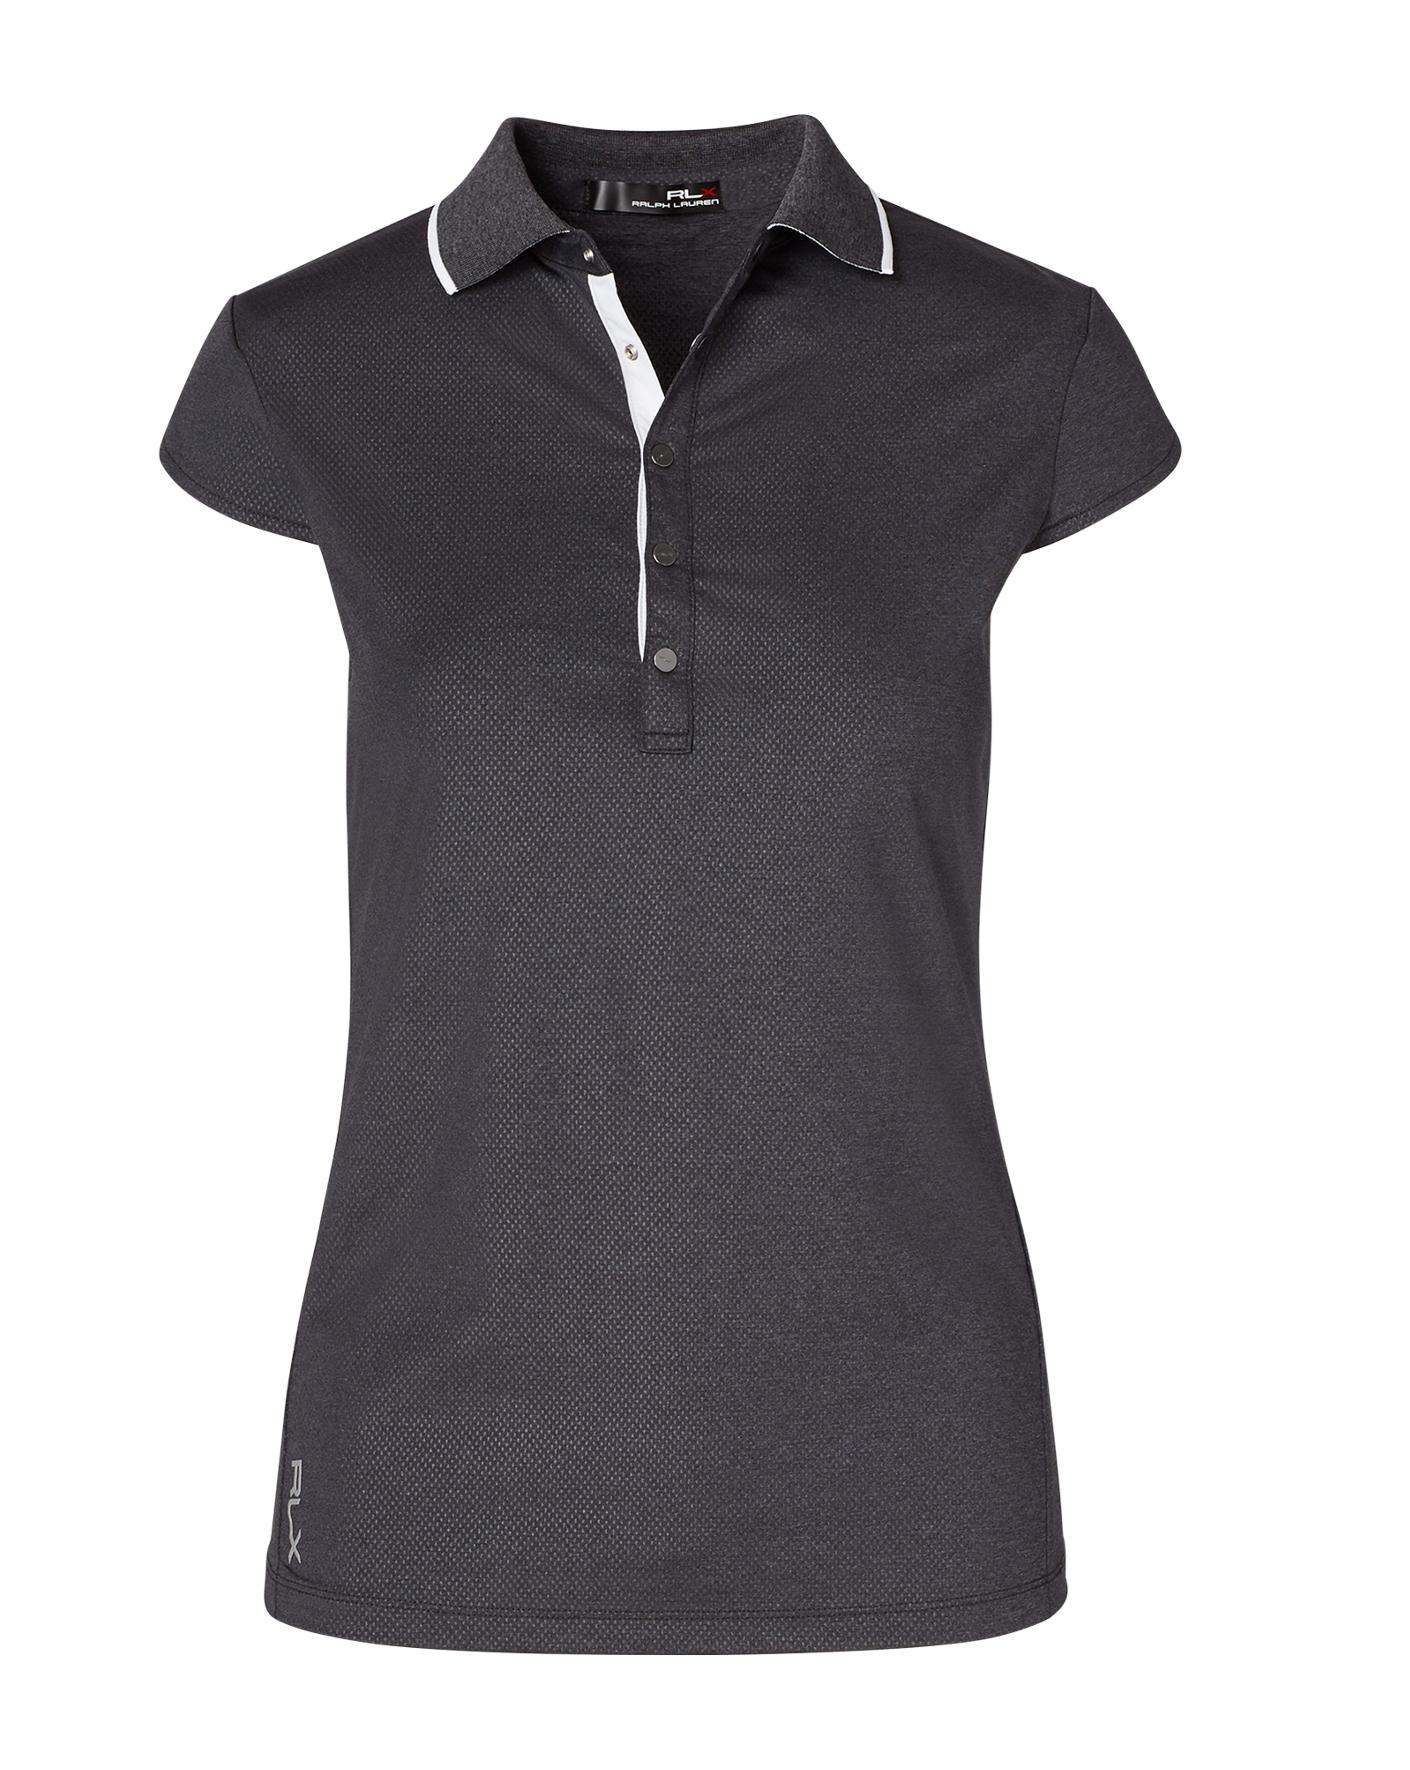 Diamond-Embossed Polo Shirt - Polo Shirts Women - RalphLauren.com